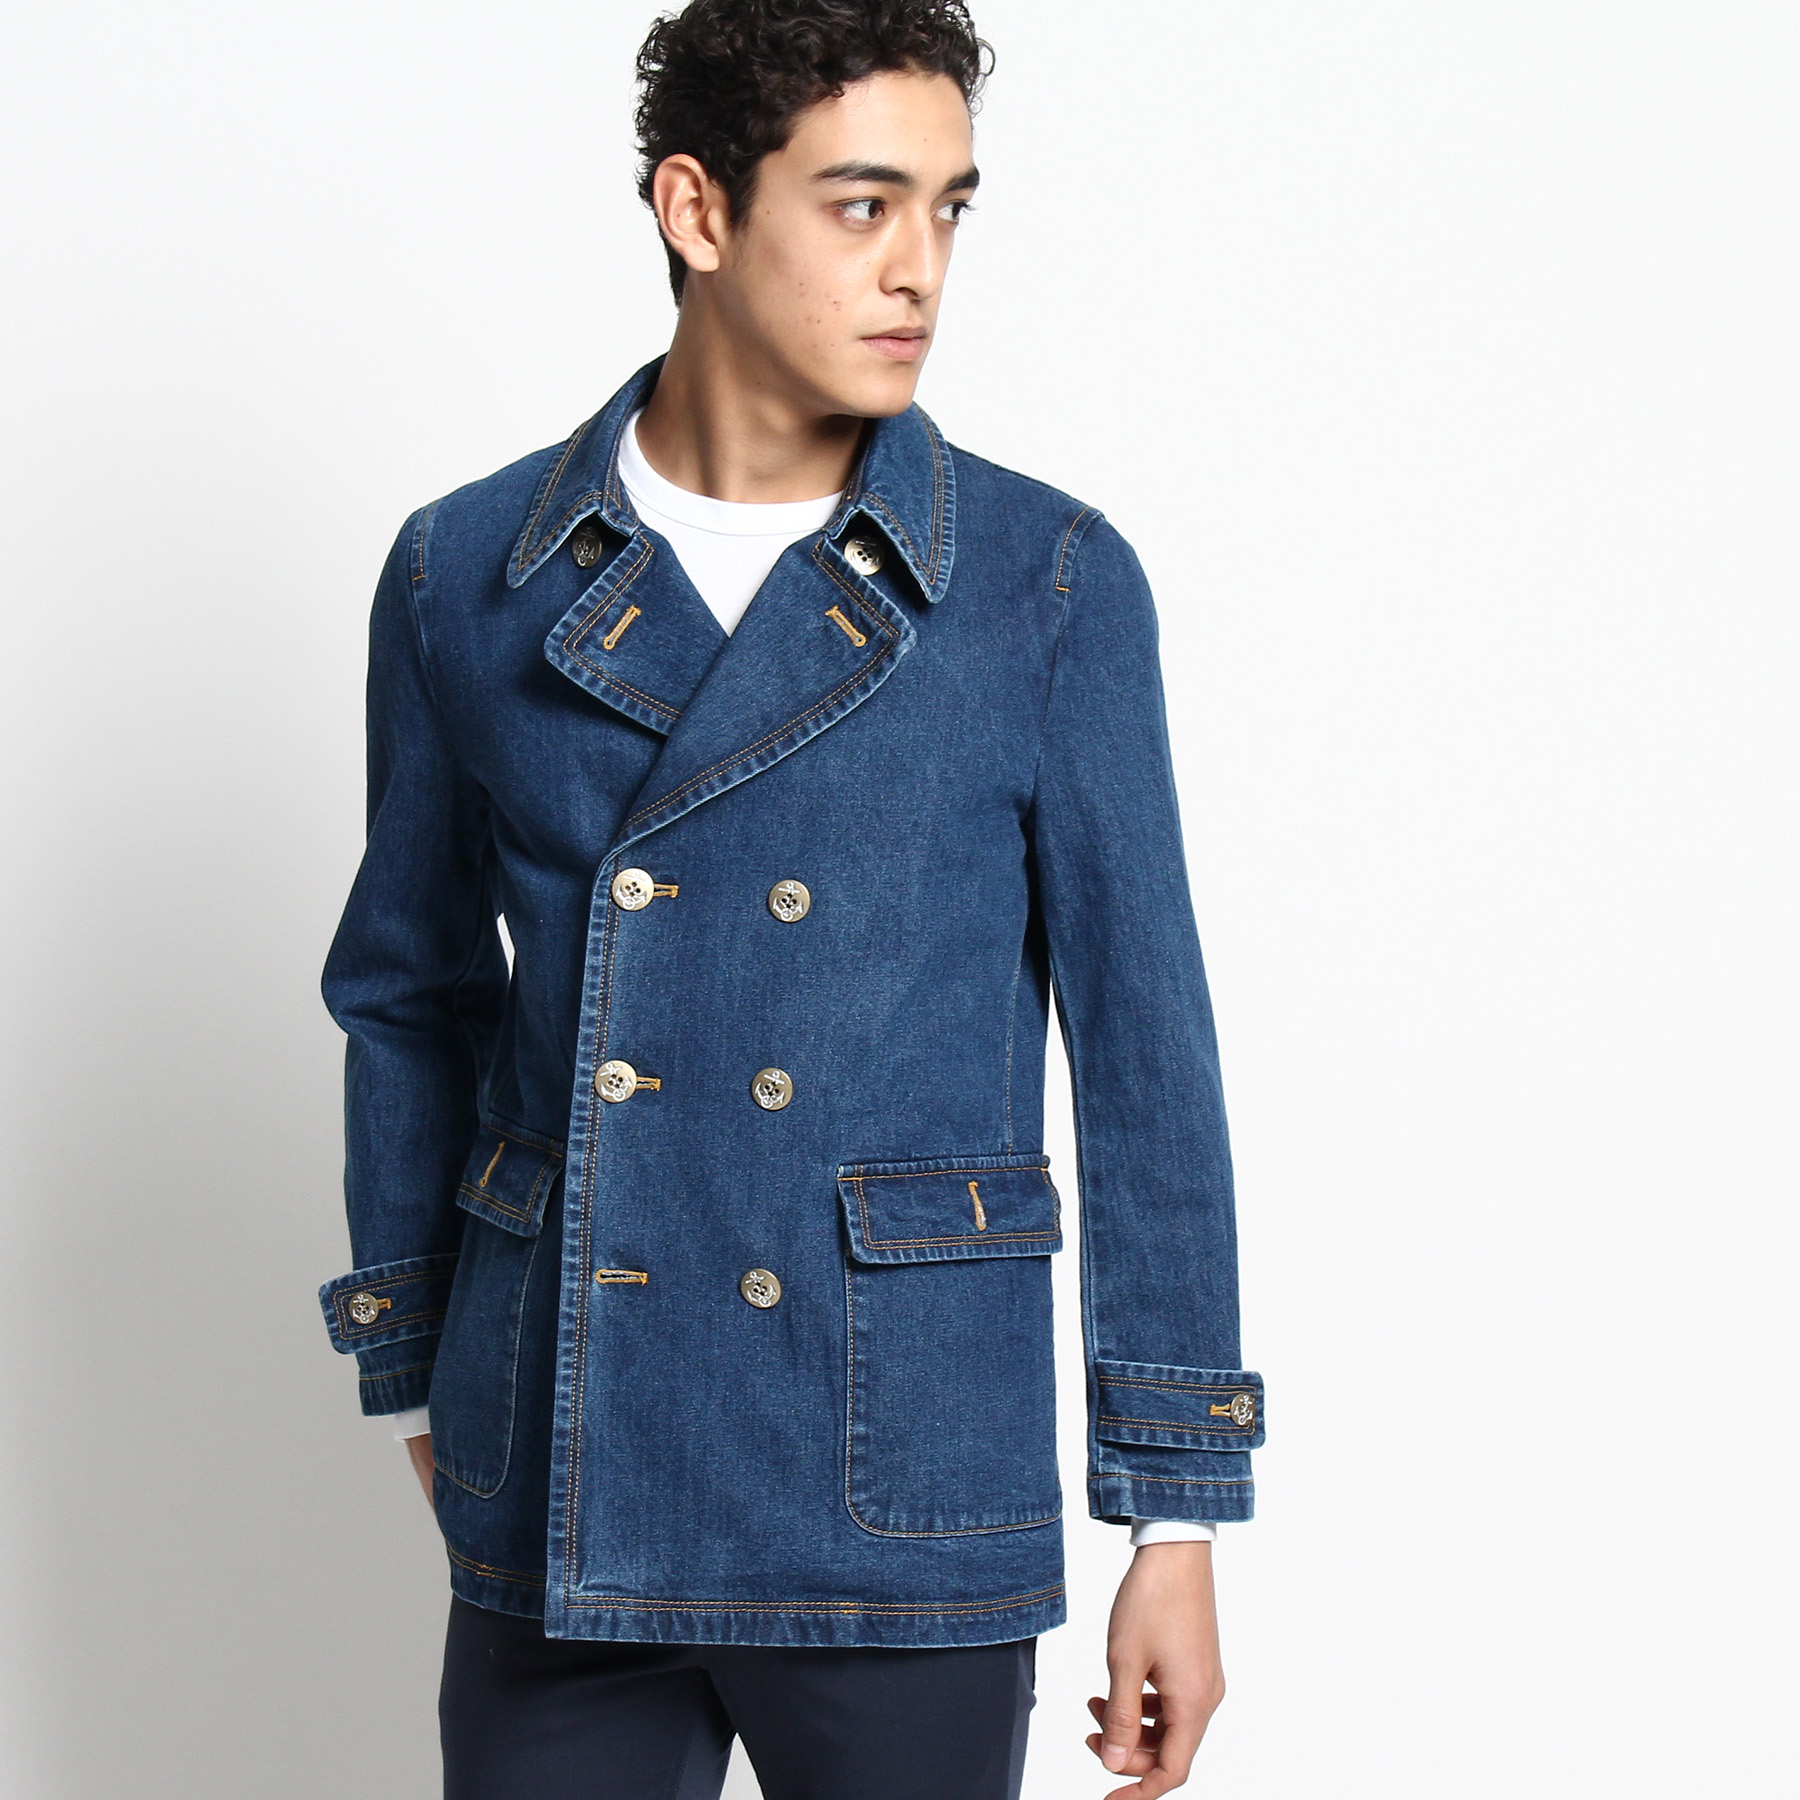 【Dessin(Men) (デッサン)】【洗える】12OZデニム ピーコートメンズ コート ピーコート ブルー